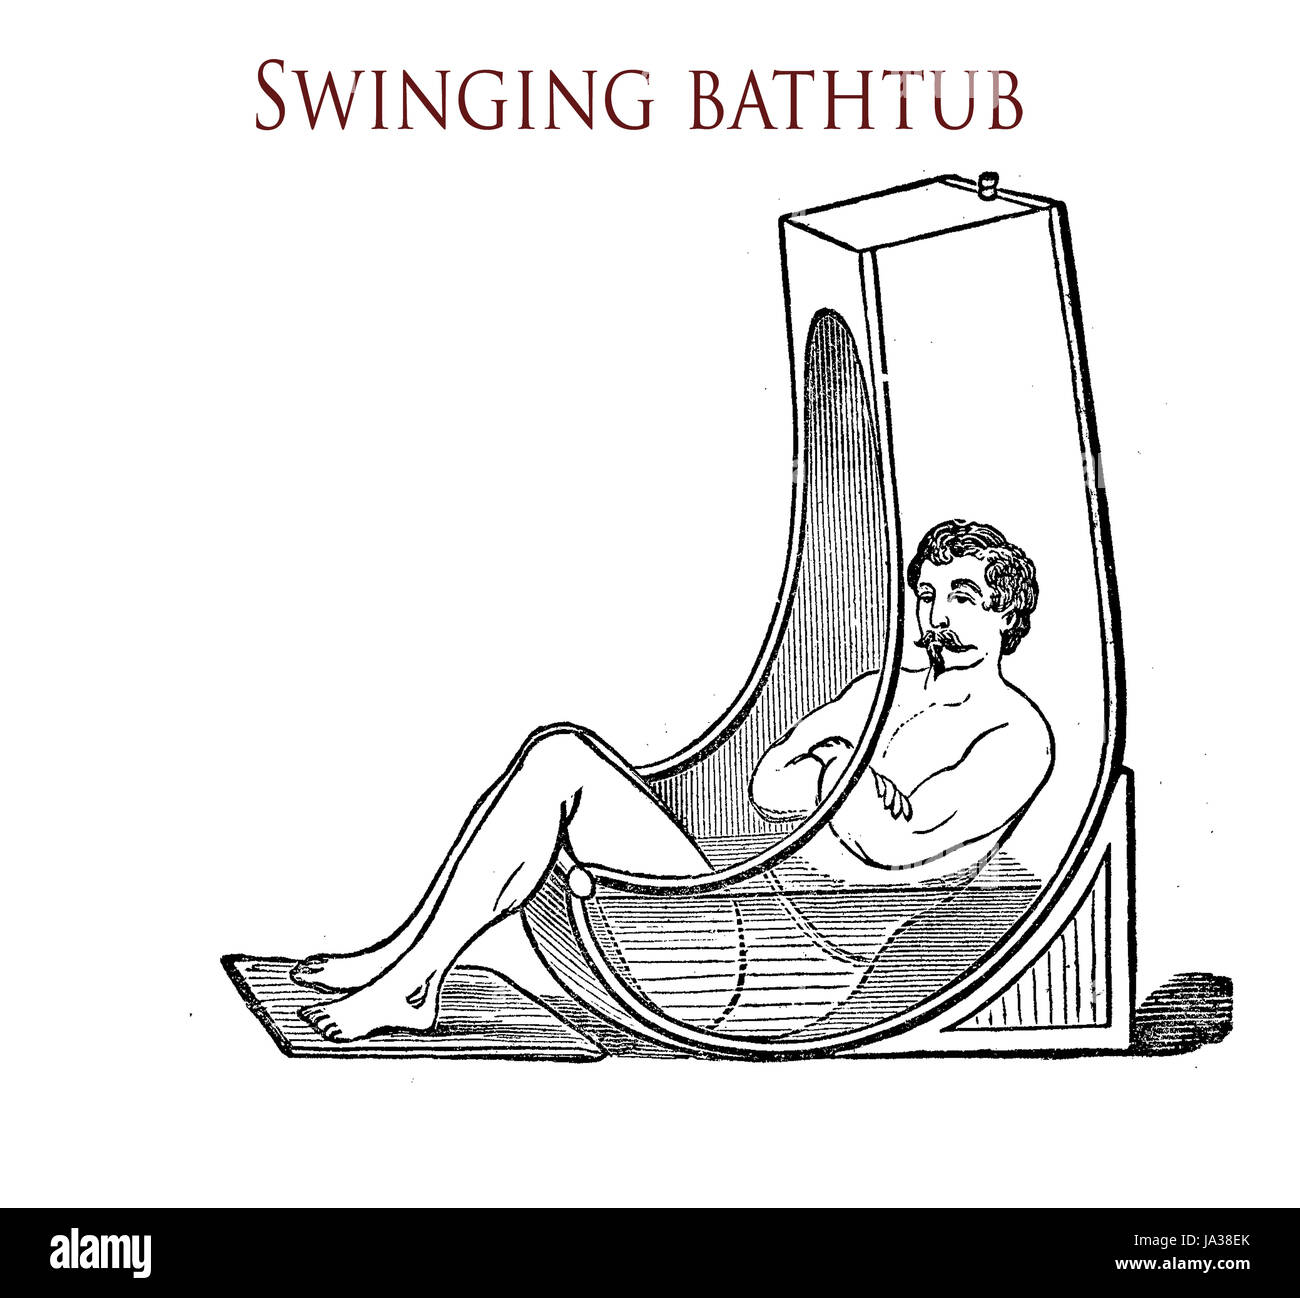 Swinging bathtub for wave bath - sitting, , vintage illustration - Stock Image